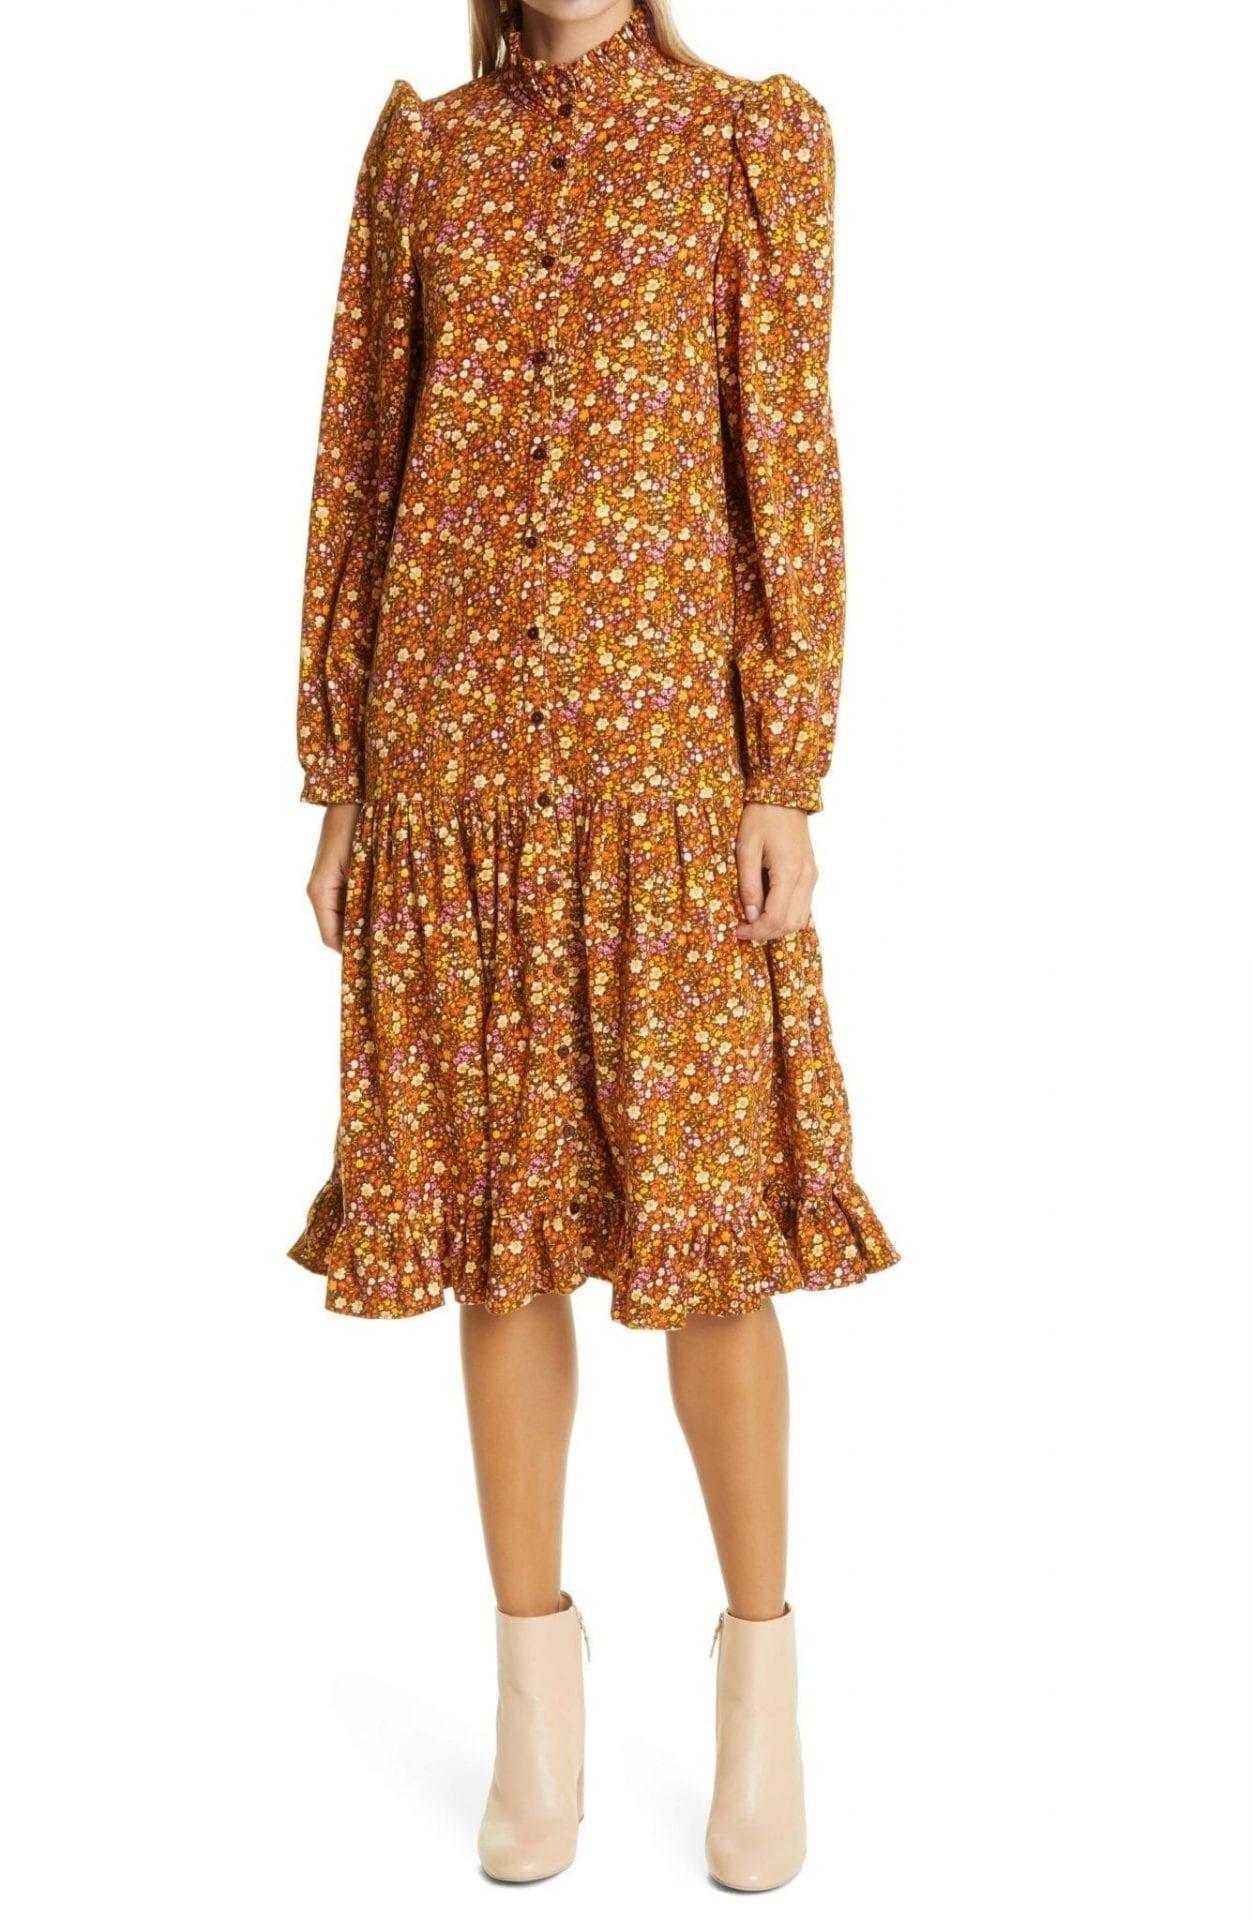 BYTIMO Floral Ditsy Long Sleeve Corduroy Midi Dress